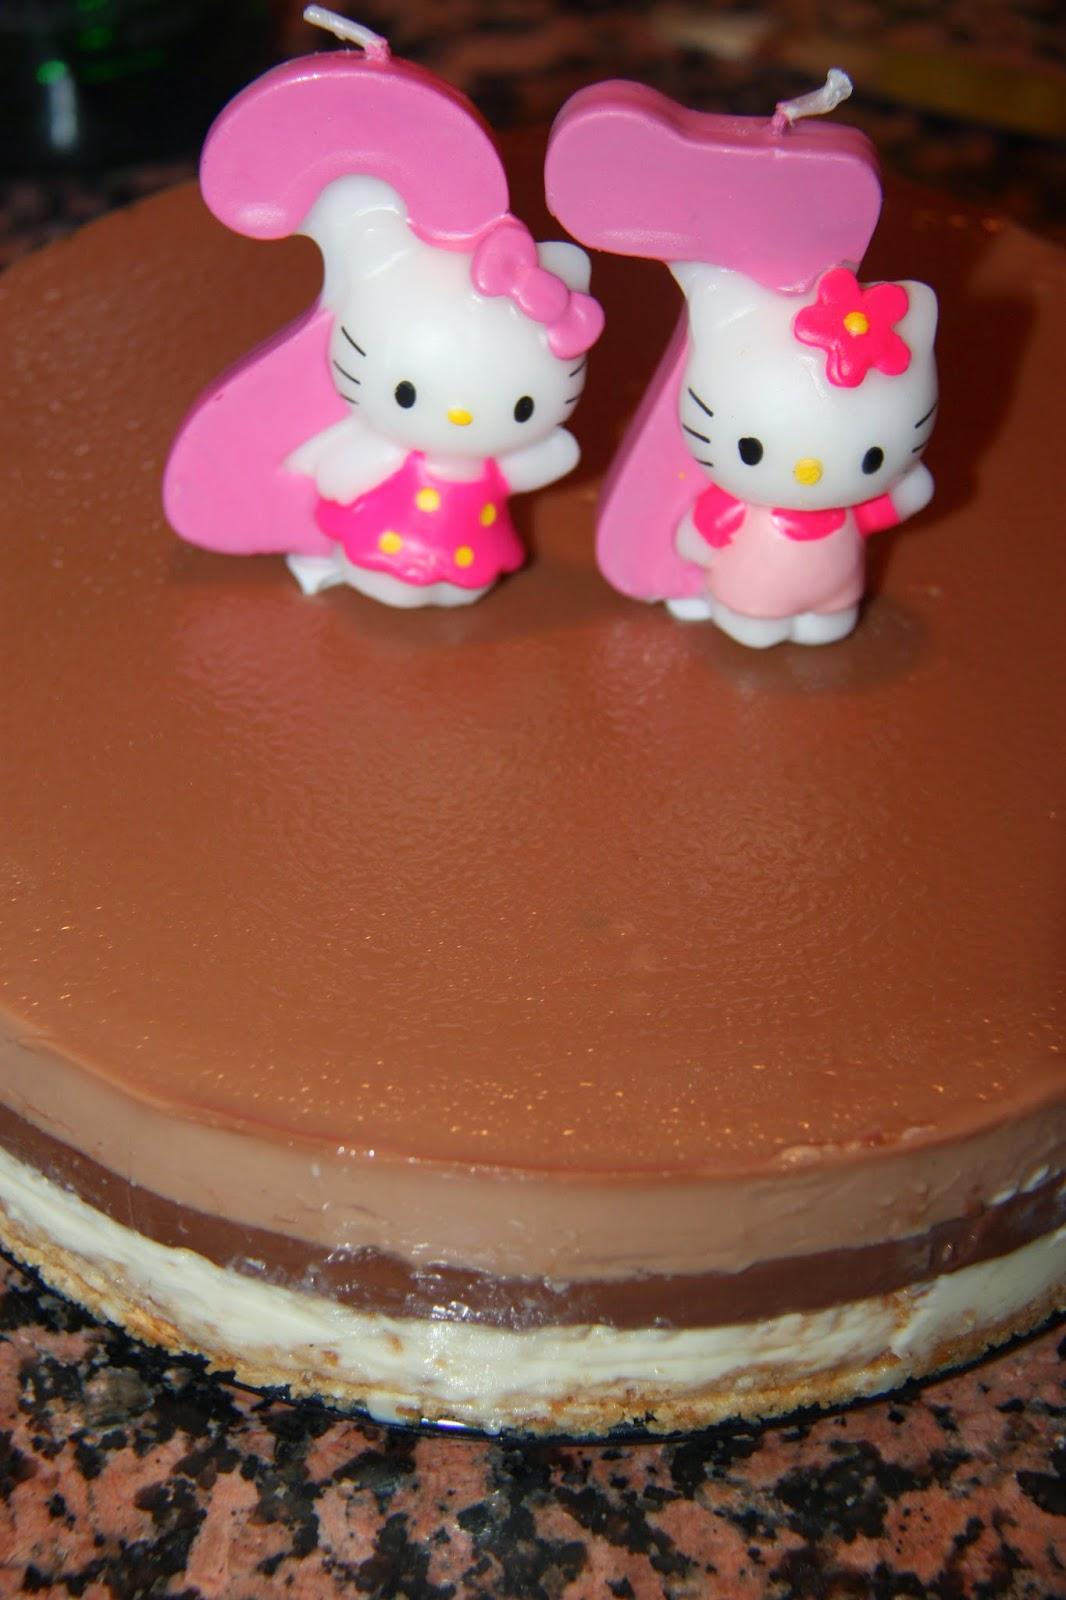 http://silviparalasamigas.blogspot.com.es/2013/05/recetita-tarta-3-chocolates-thermomix.html